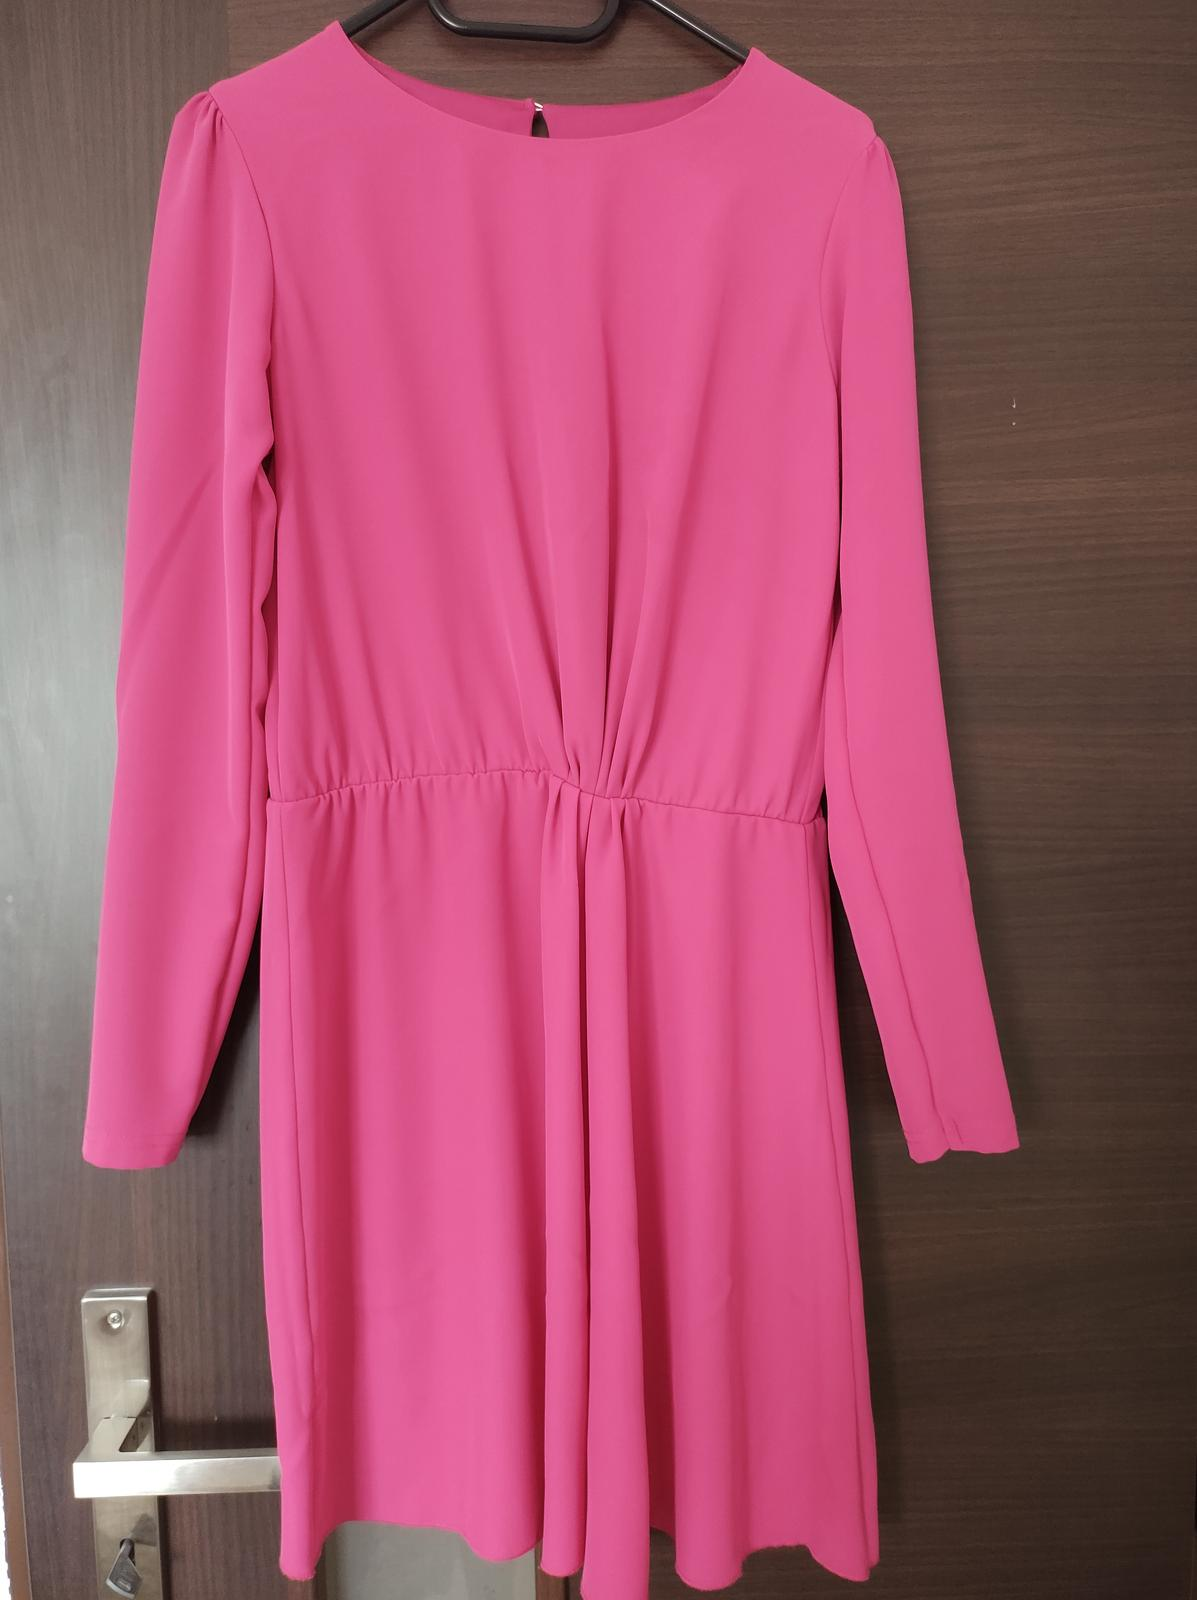 cyklamenove šaty - Obrázok č. 1